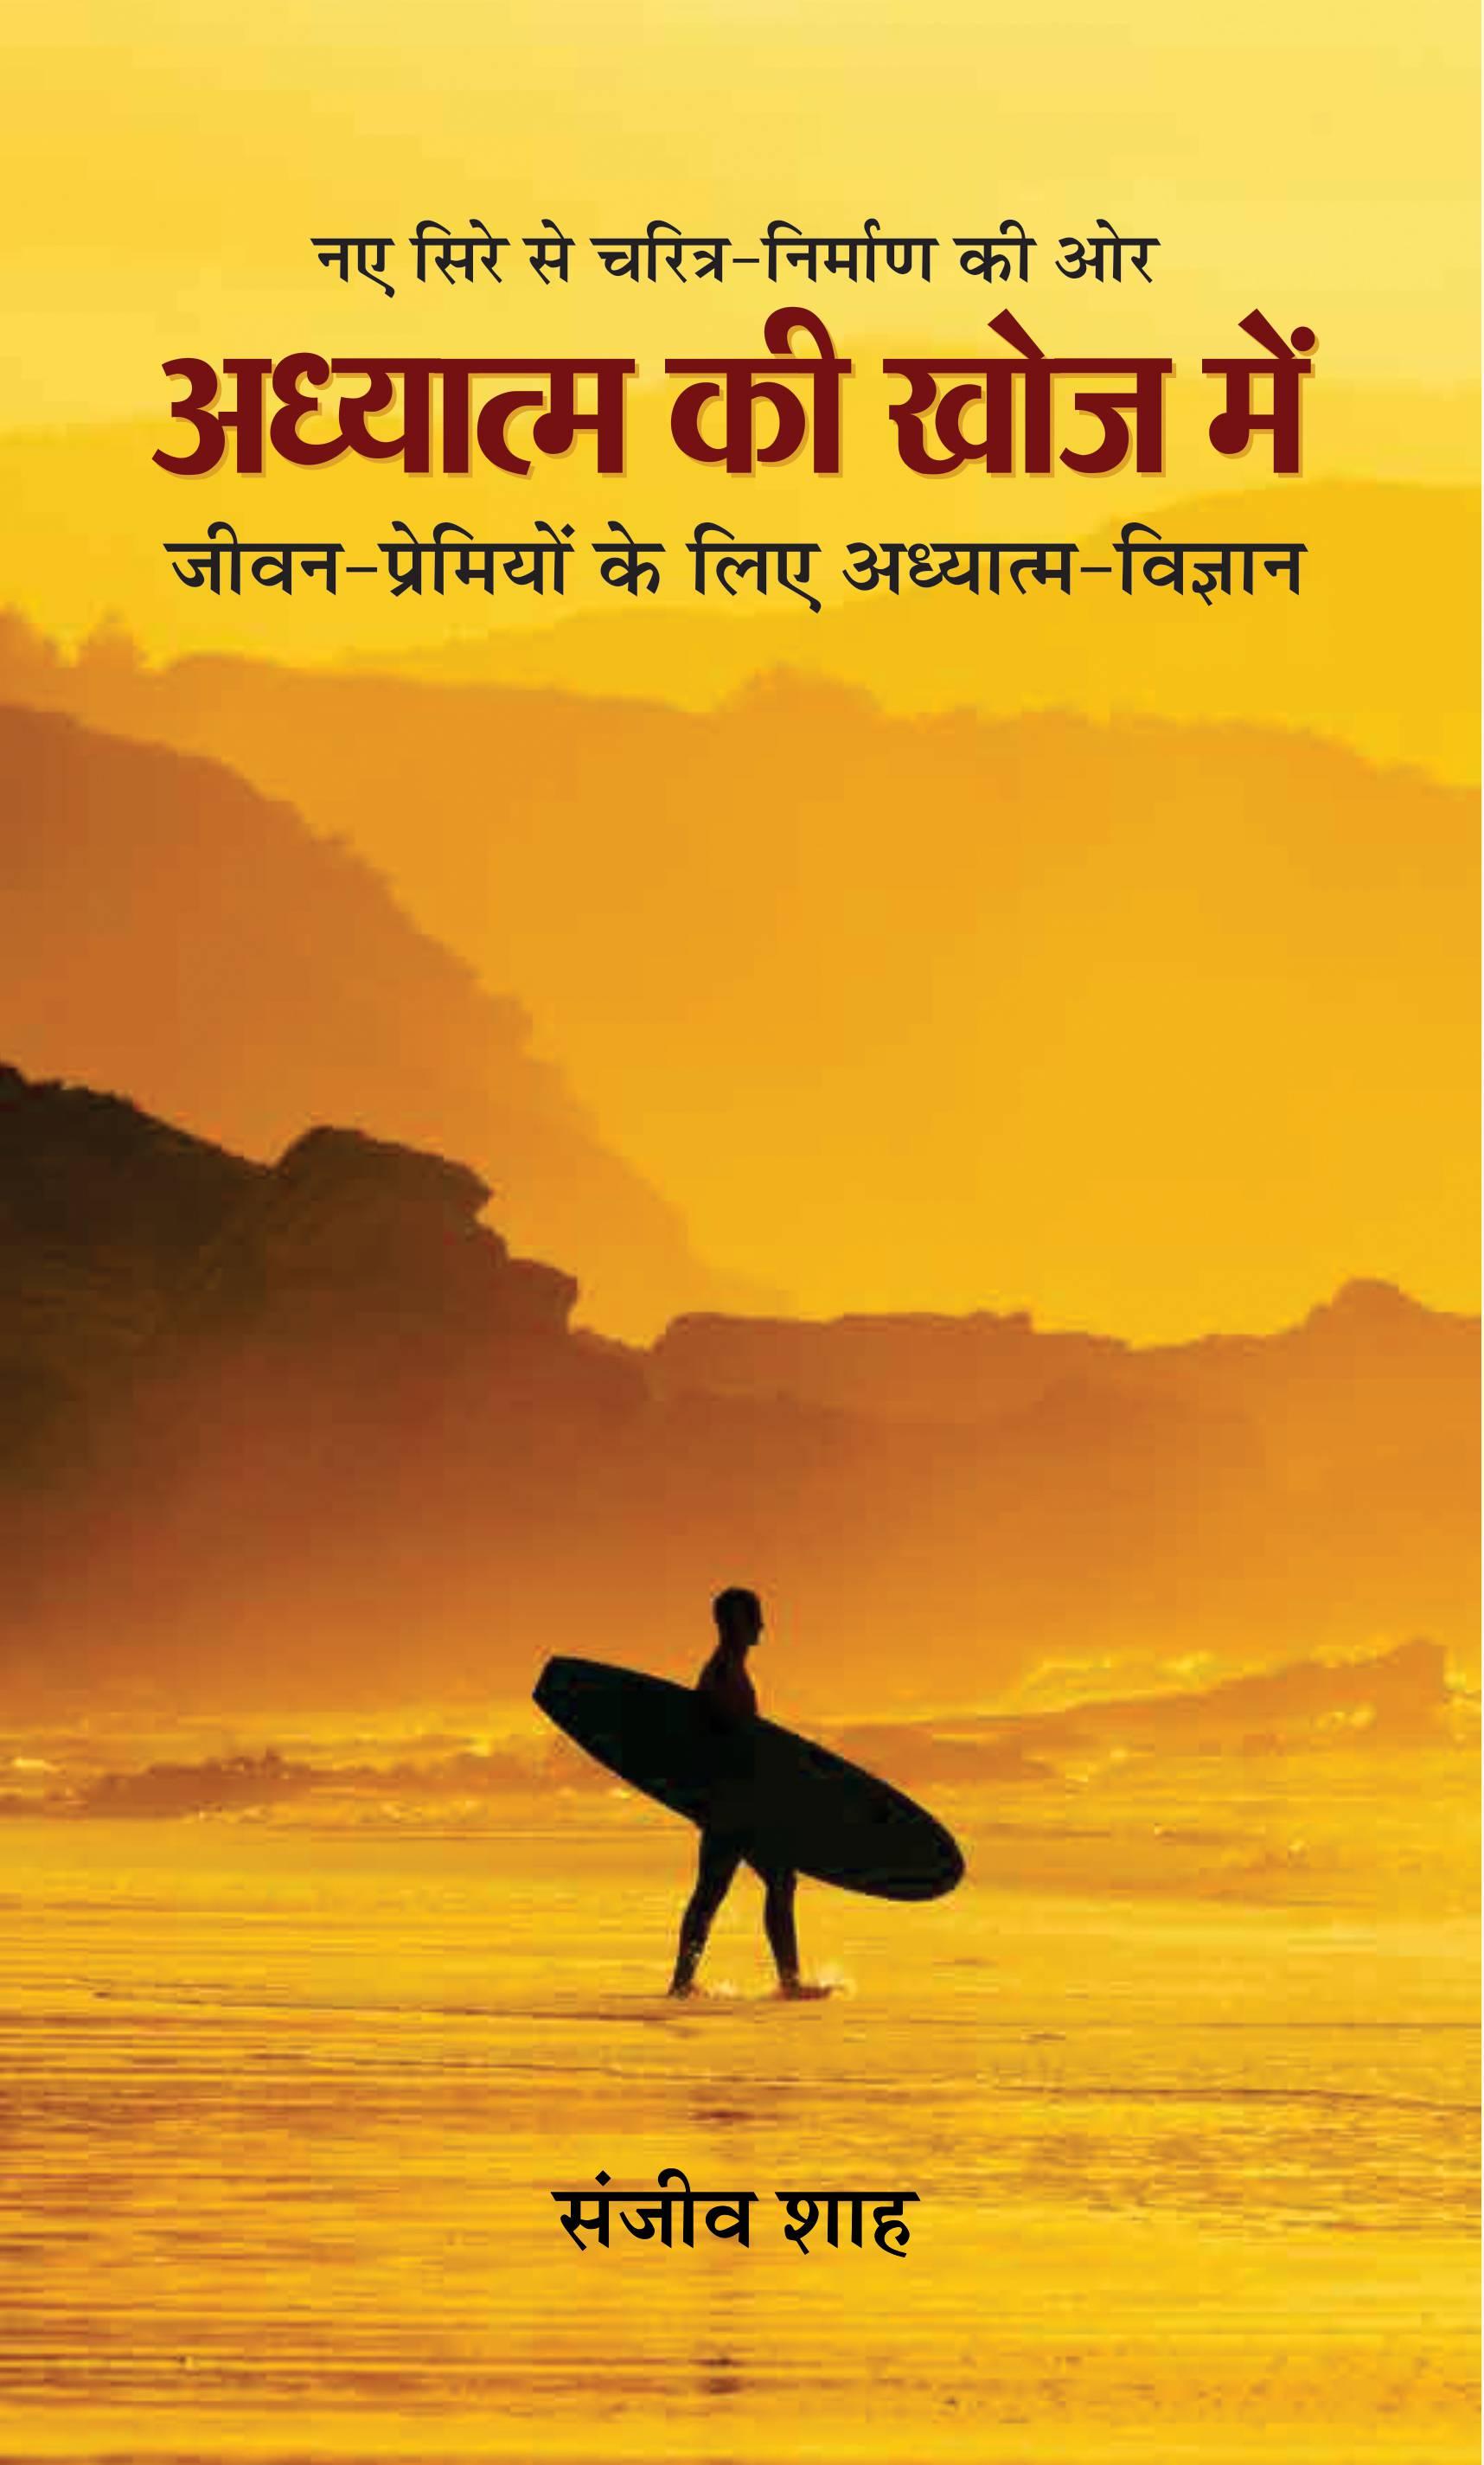 Adhyatma Ki Khoj Mein